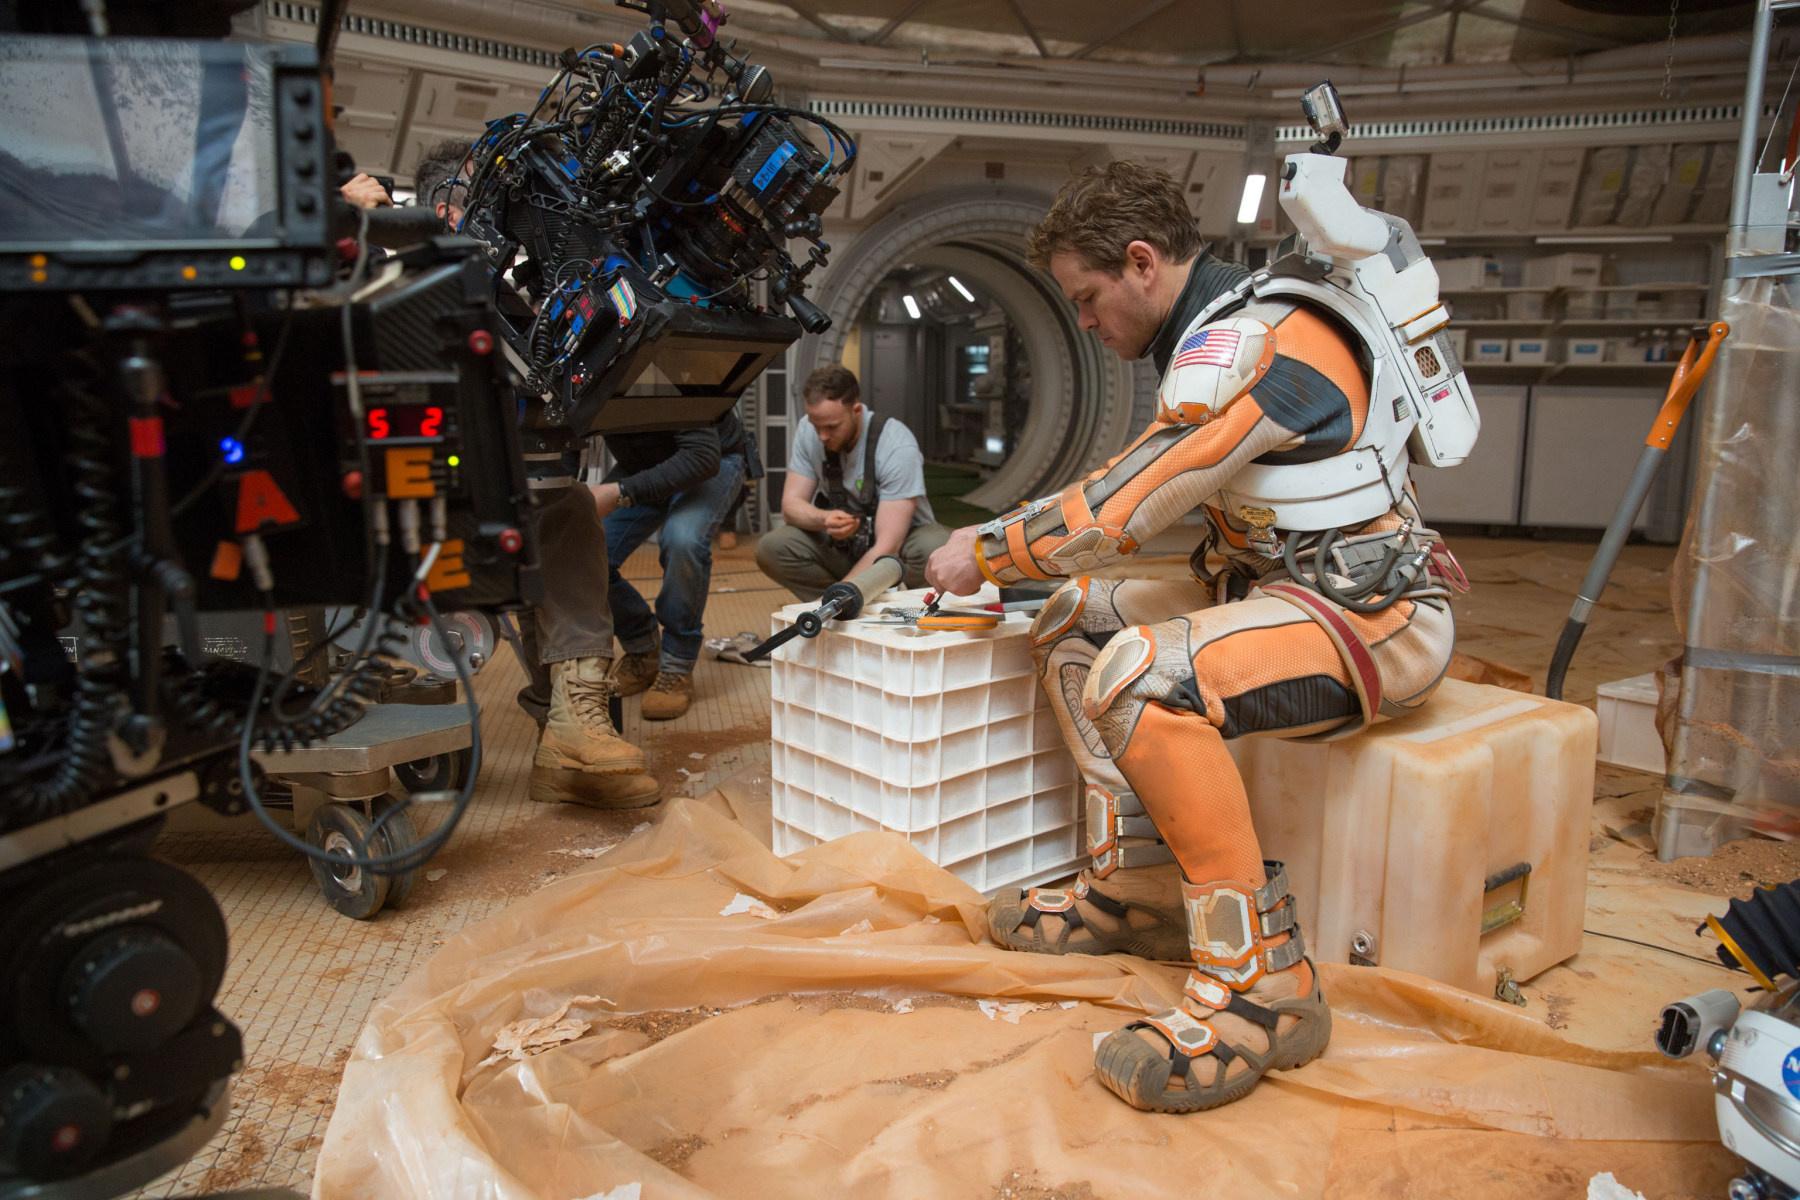 Matt Damon getting handy for a scene in The Martian.